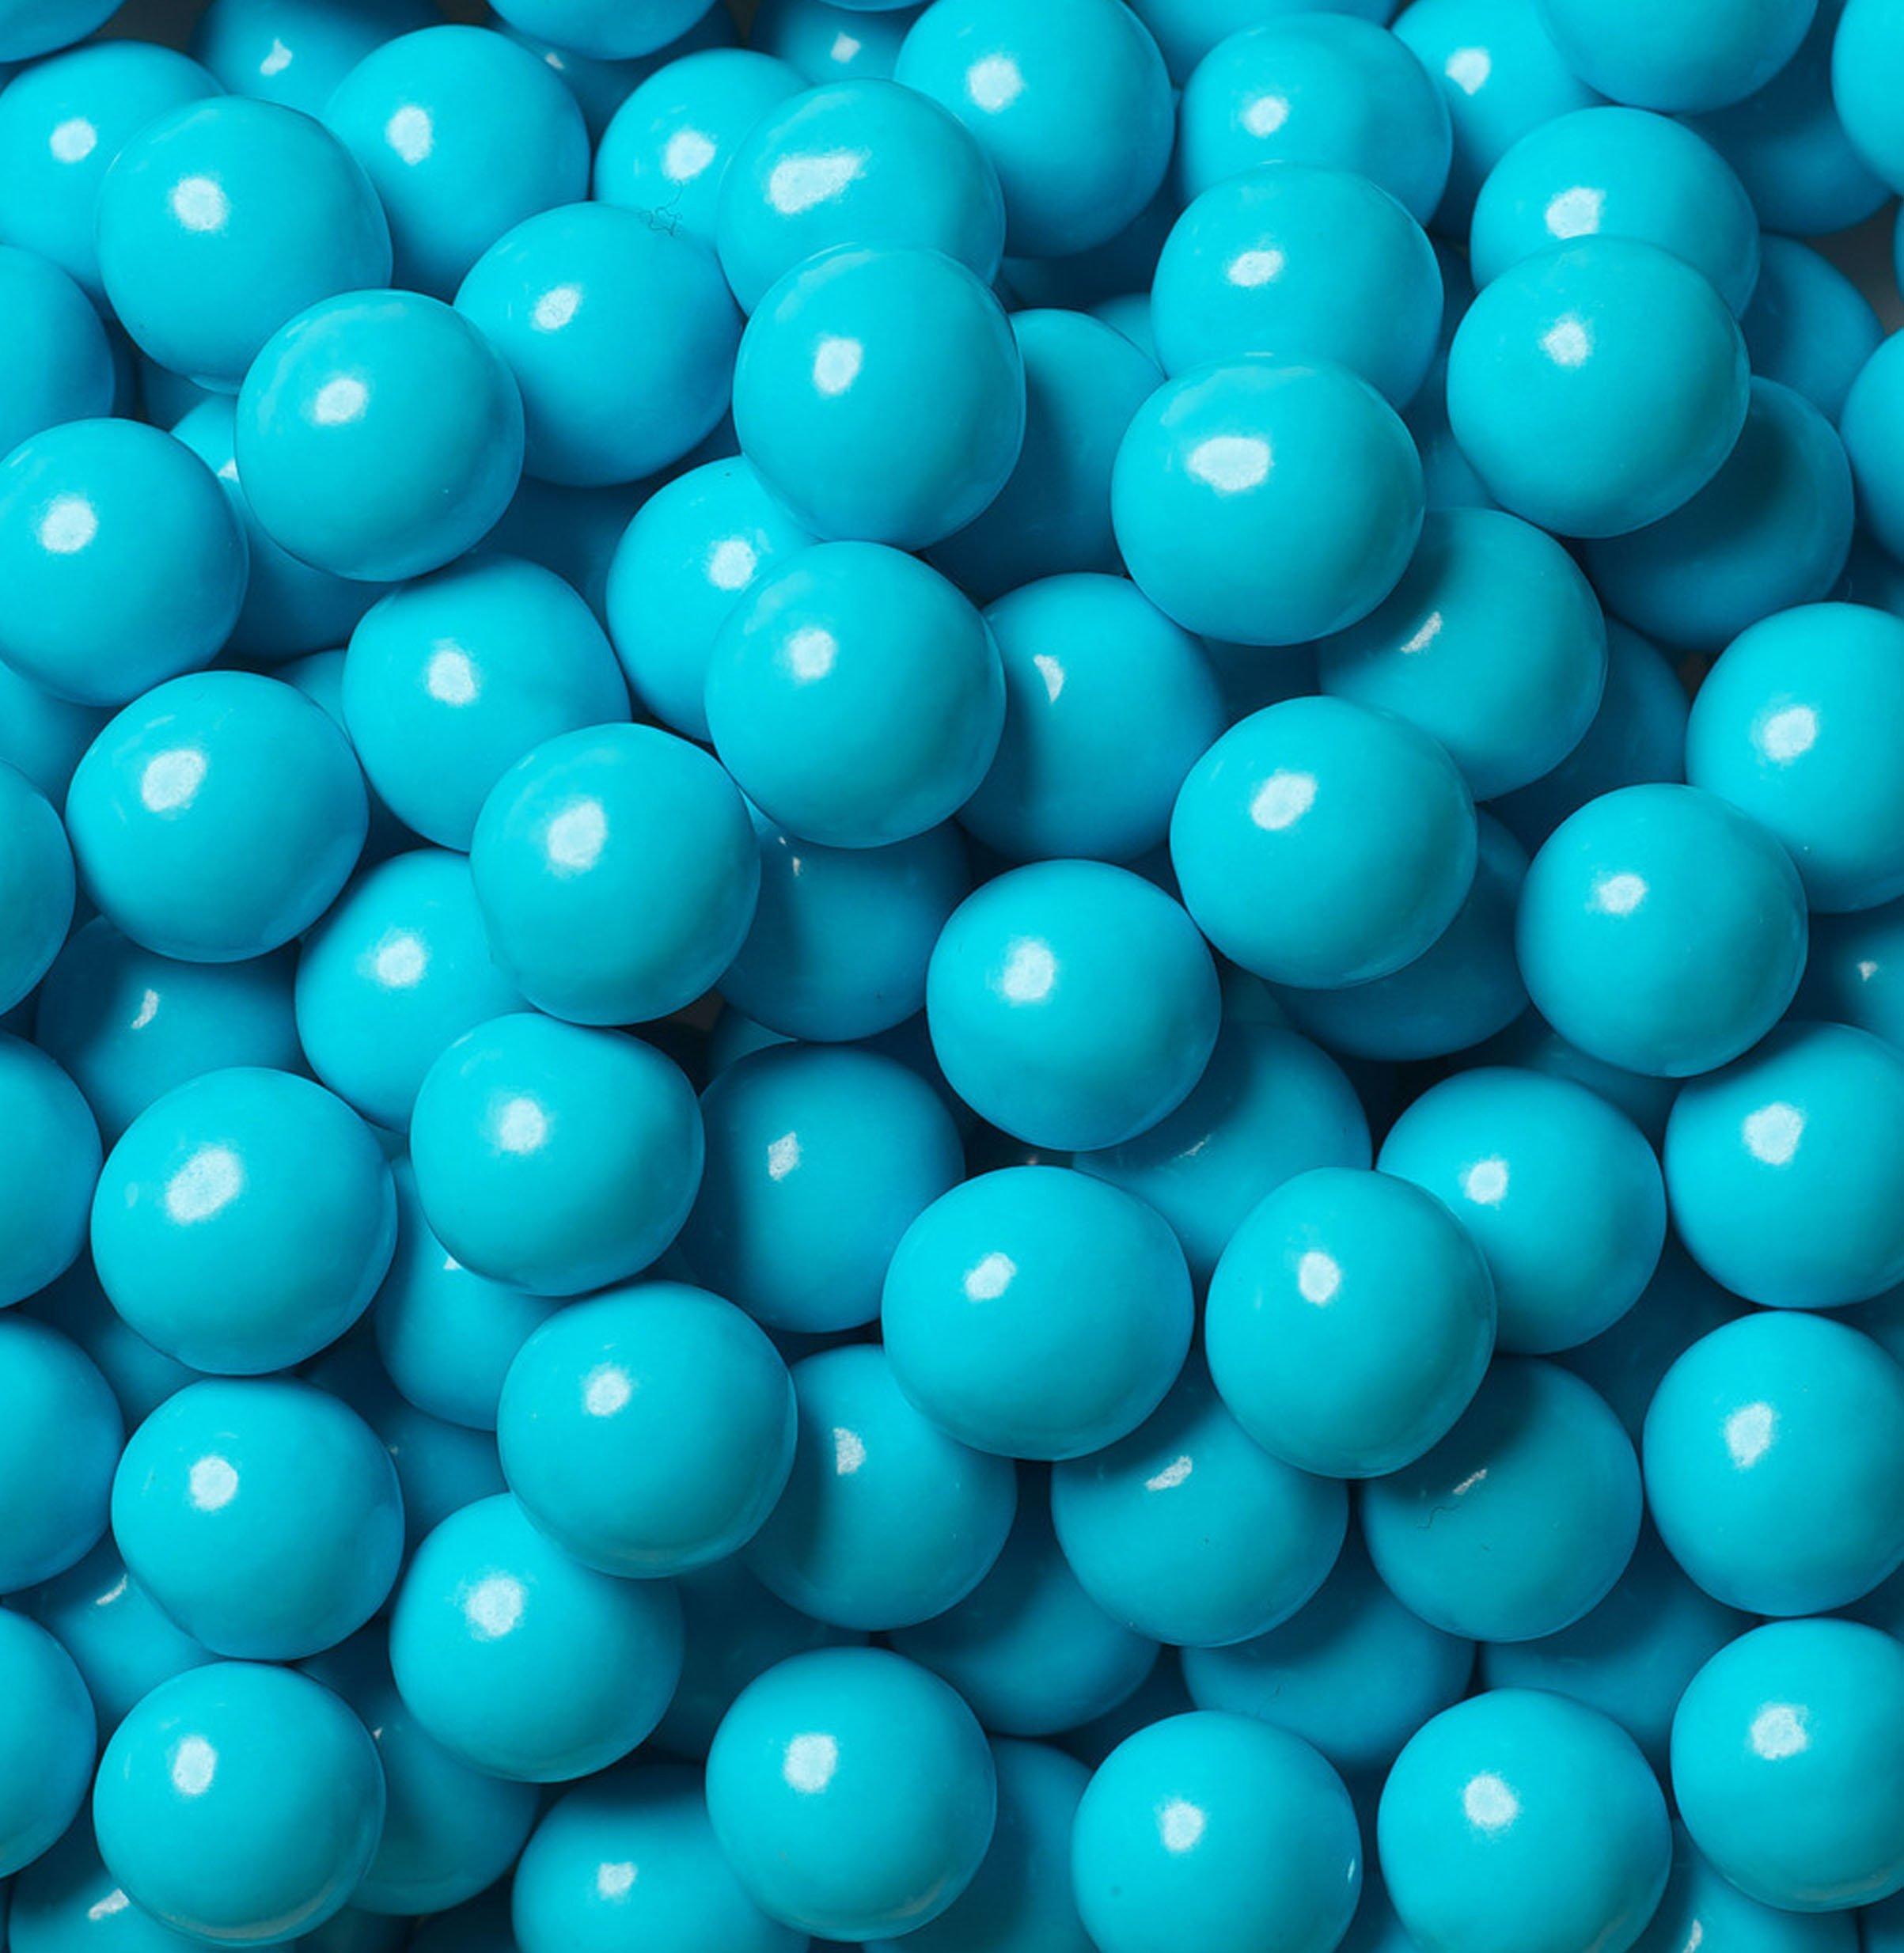 Sixlets - Powder Blue (2 lb bag)